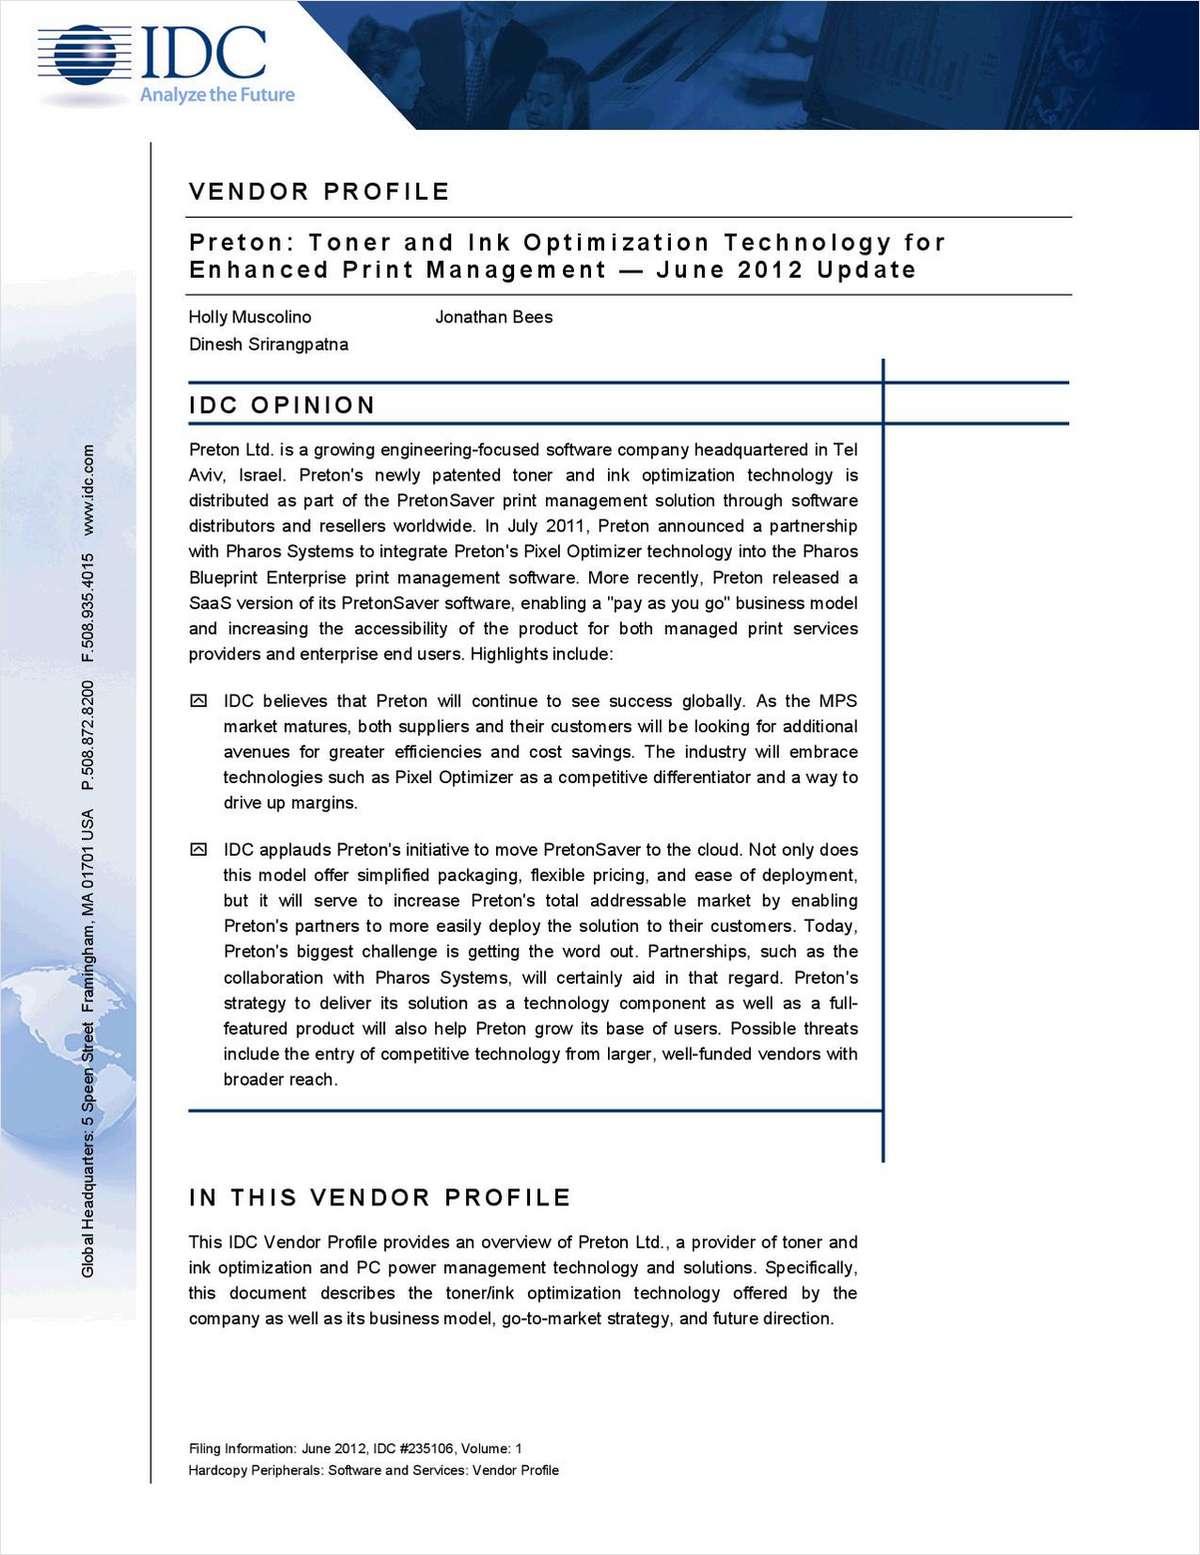 Technology for Enhanced Print Management